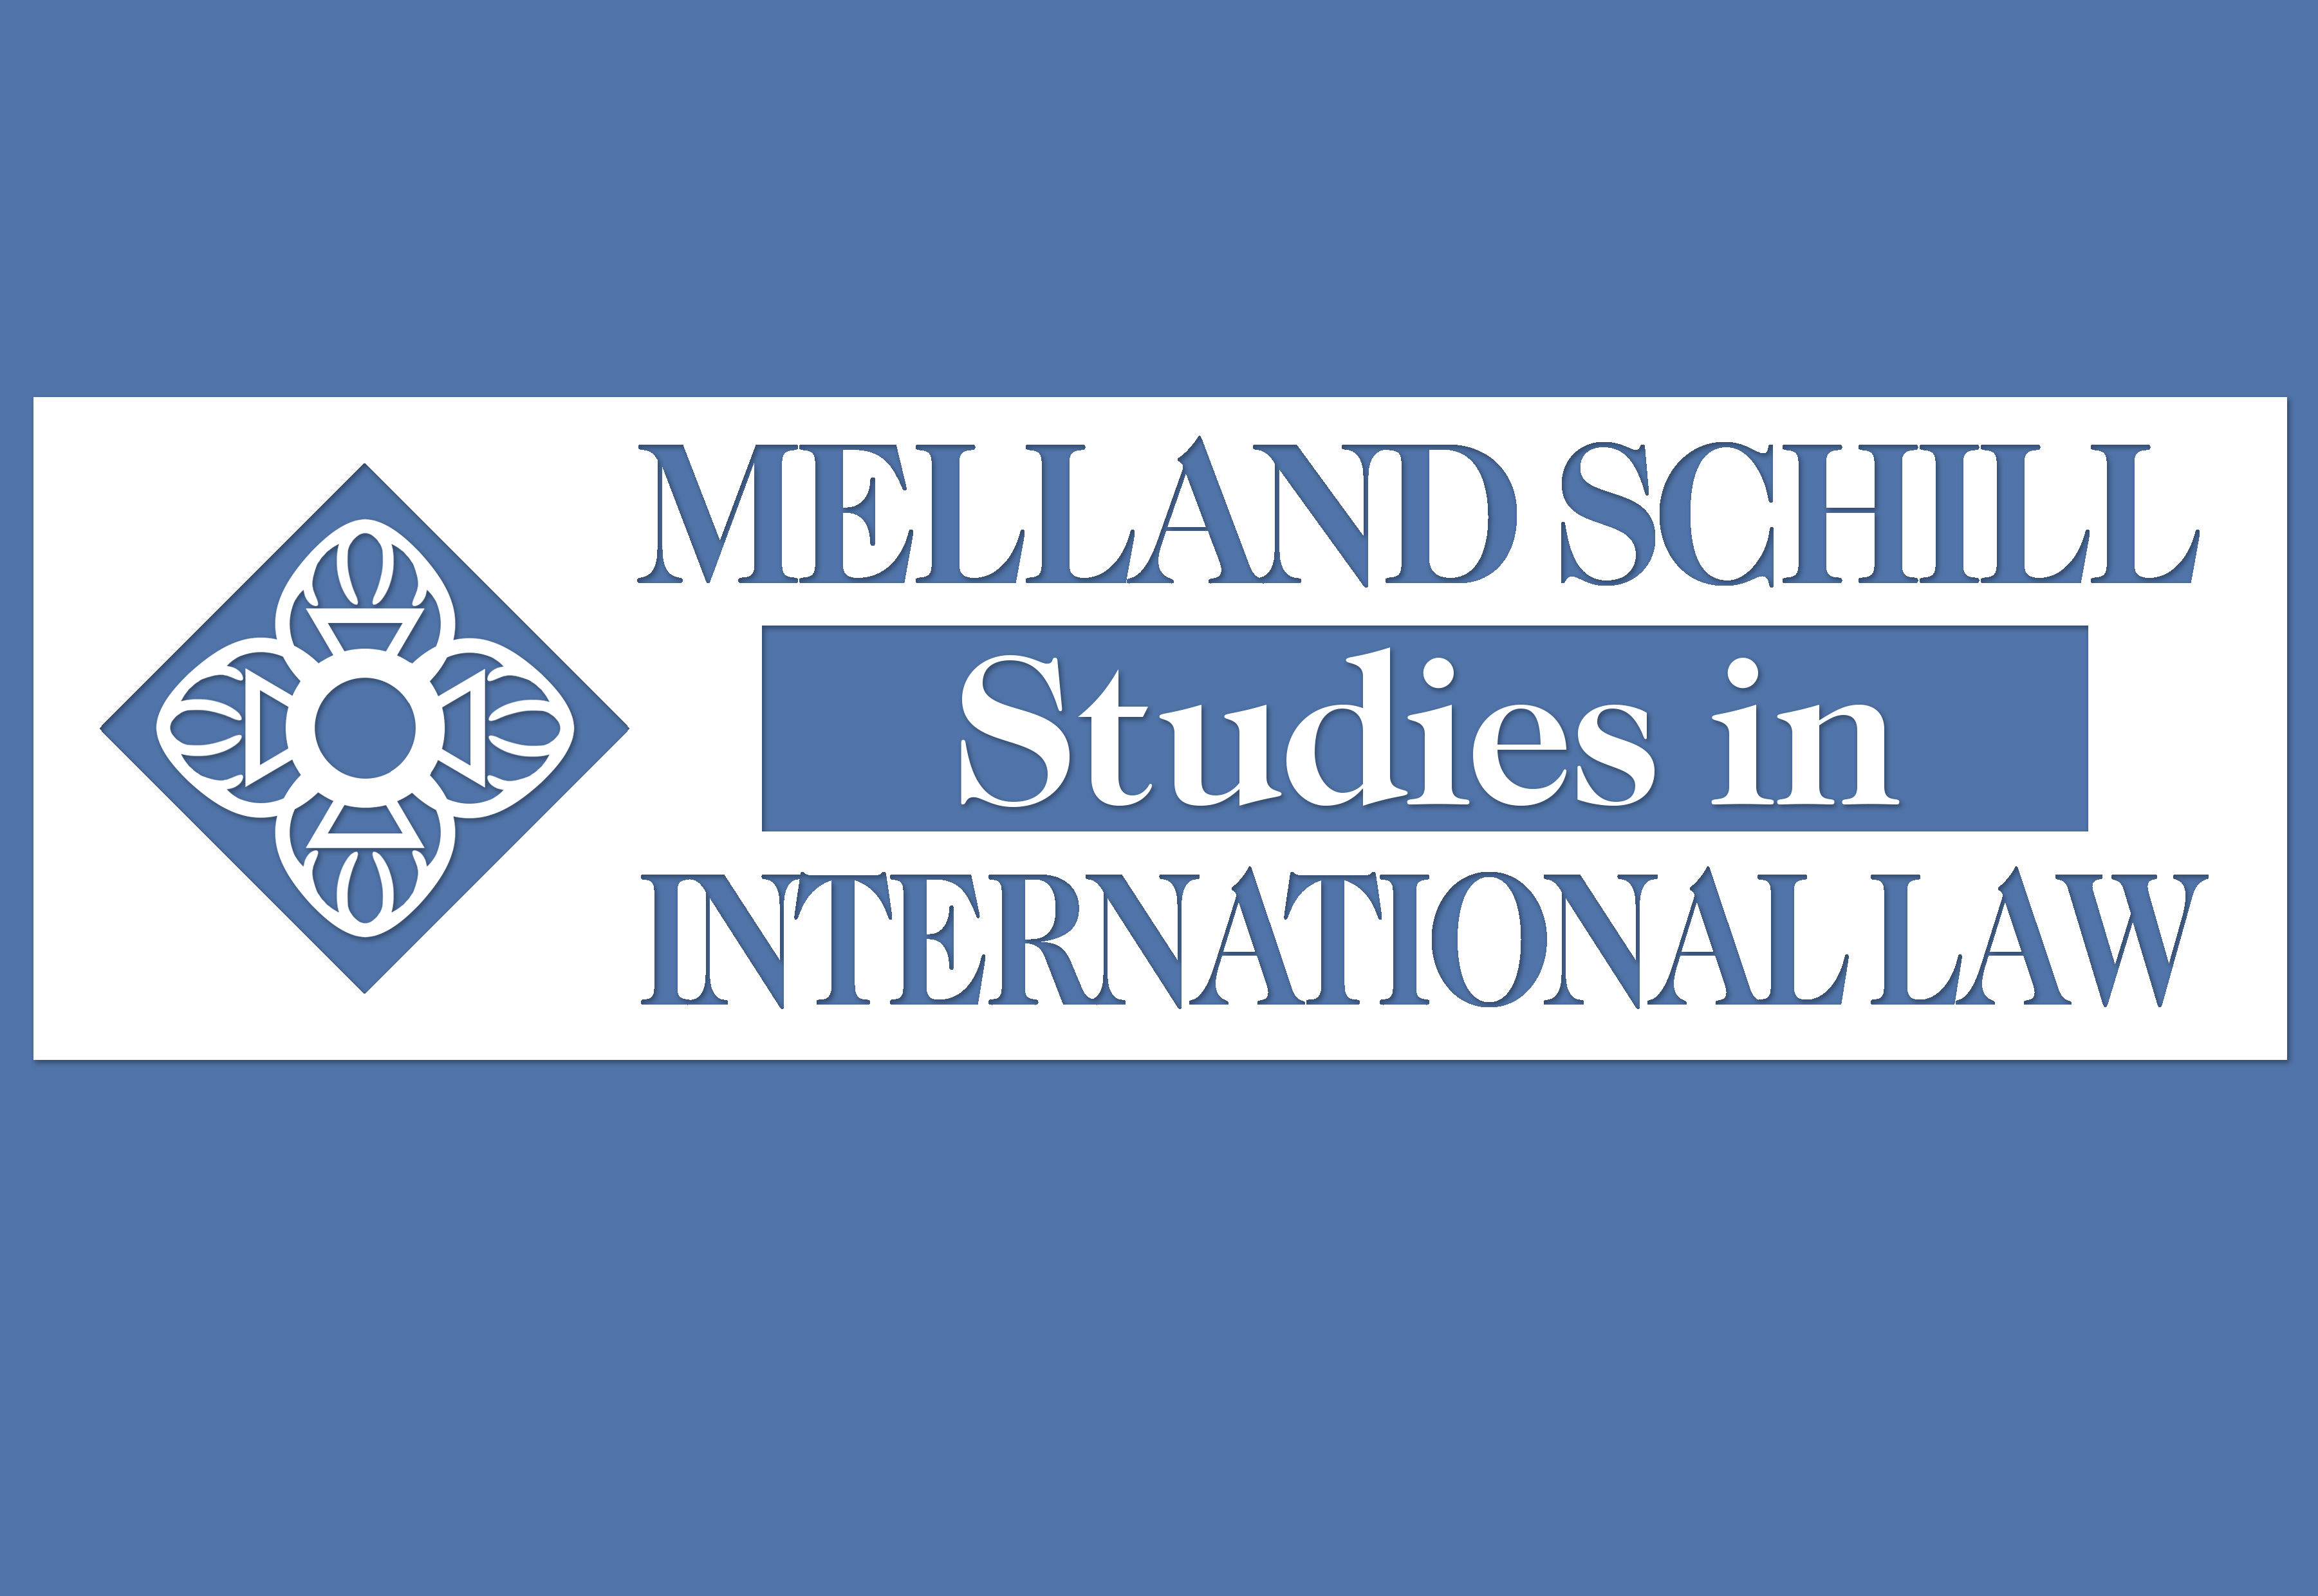 Melland Schill Studies logo